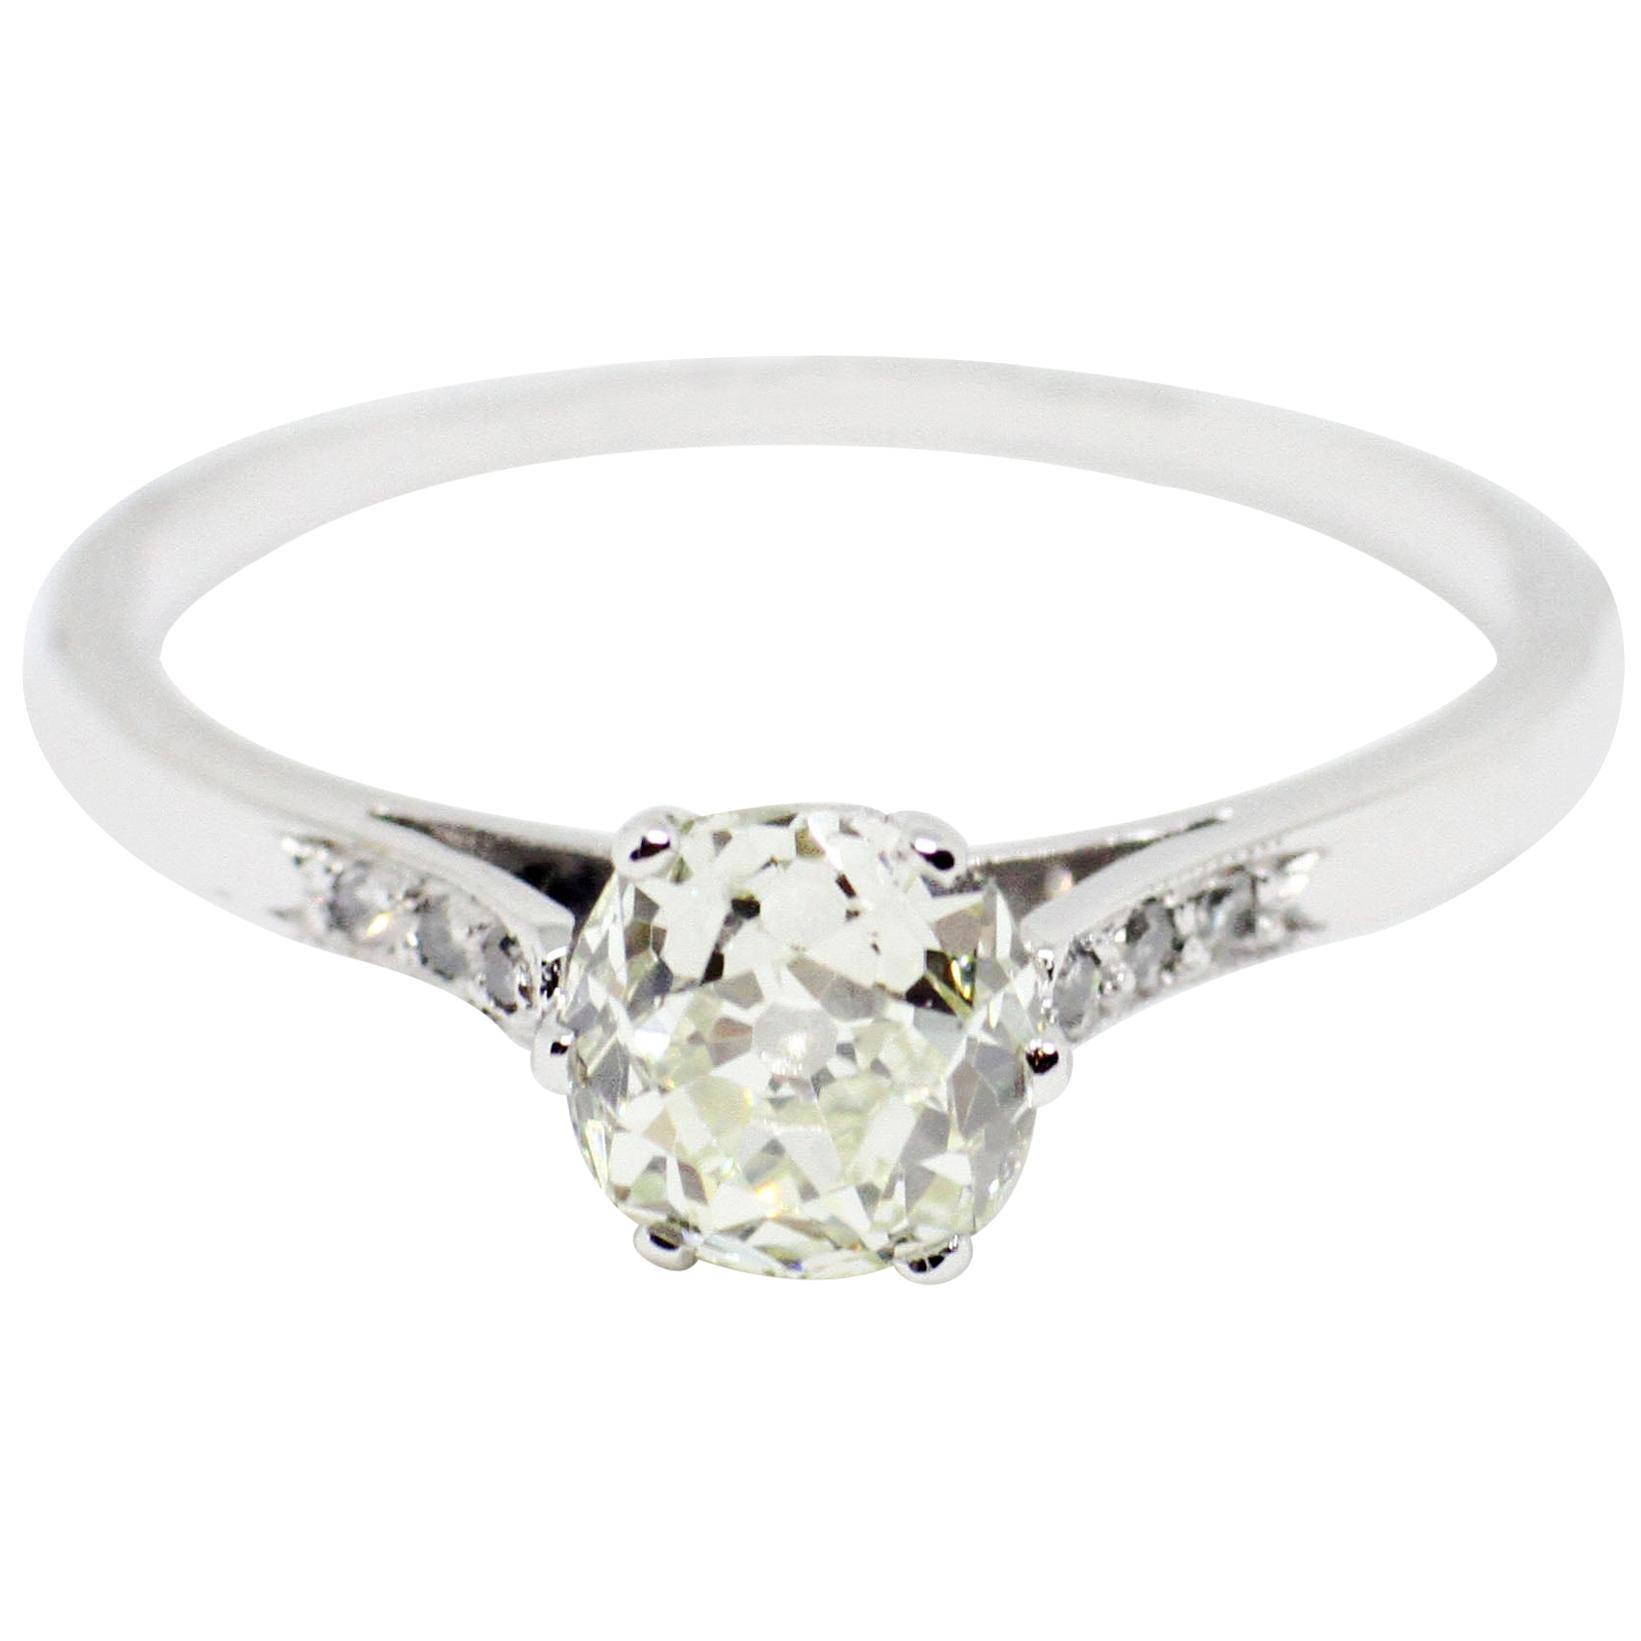 1.07 Carat Old Mine Cut Diamond Platinum Engagement Ring